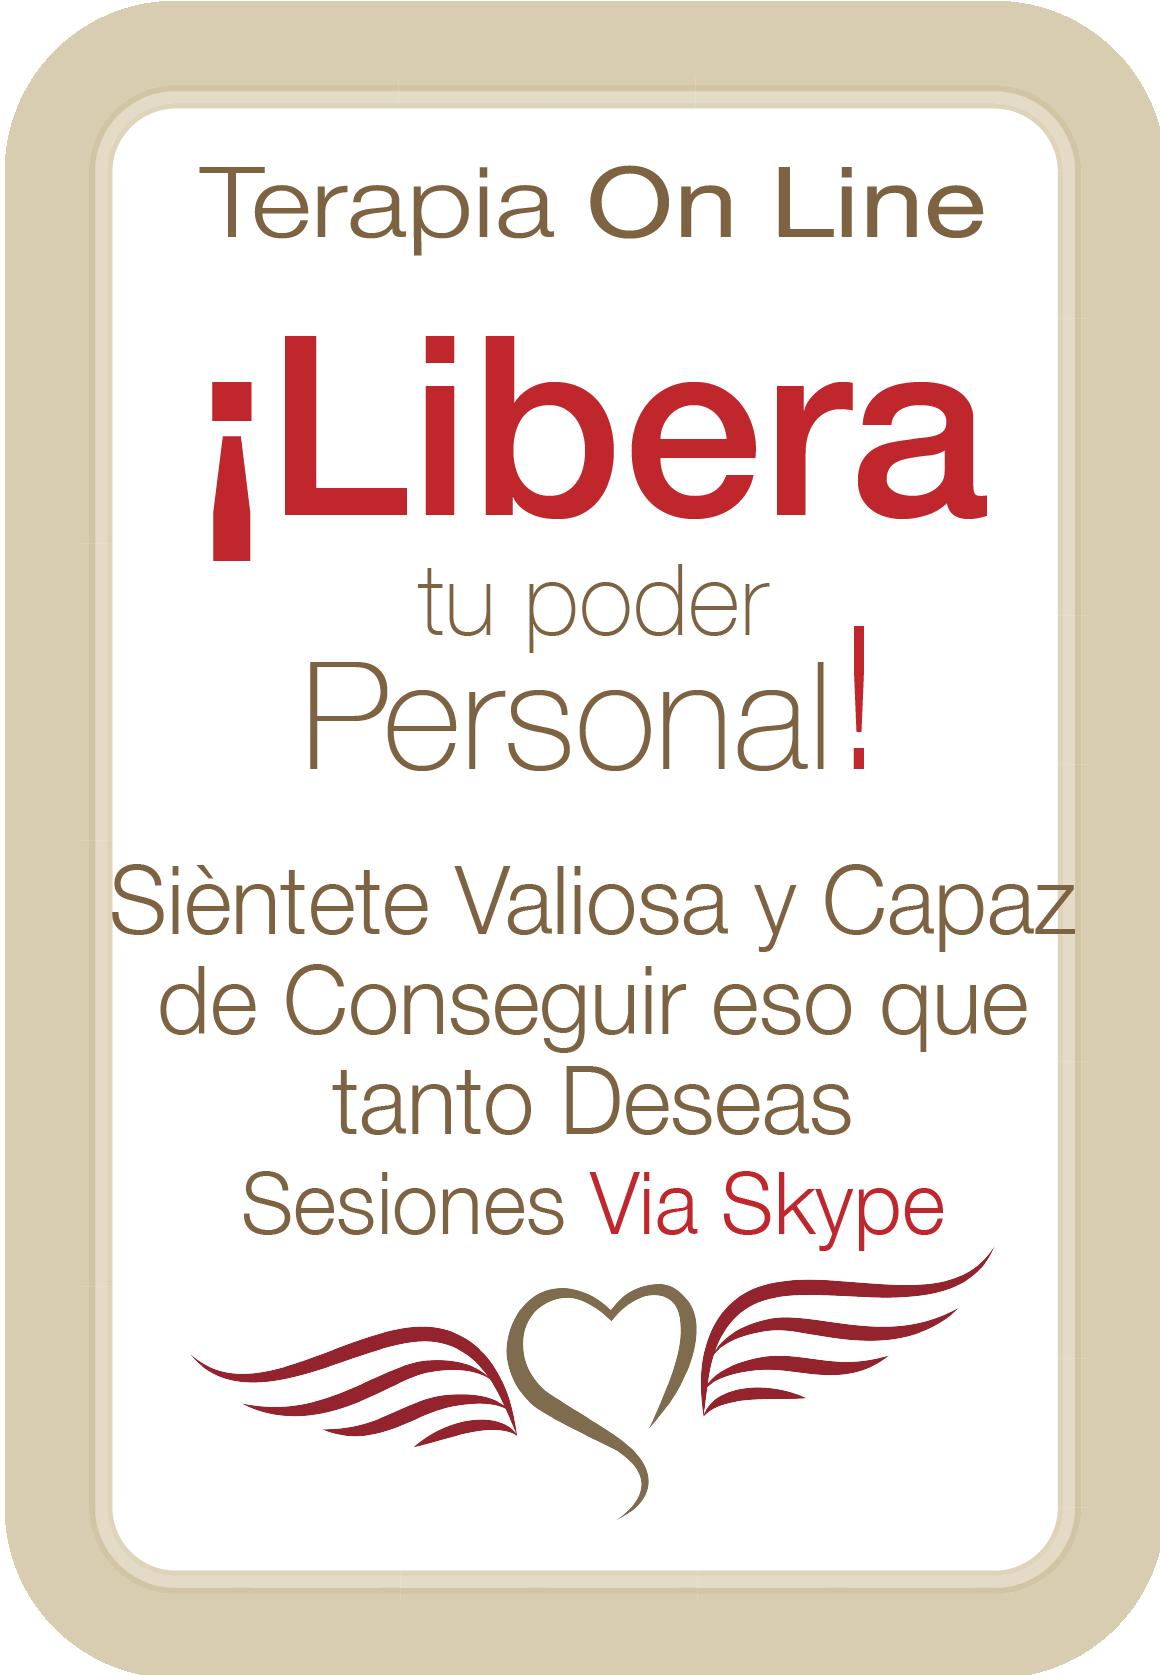 despierta-tu-poder-personal_online-elvira-muliterno-mujer-empoderamiento-empowermente-jefa-autoridad-poder-femenino-terapia